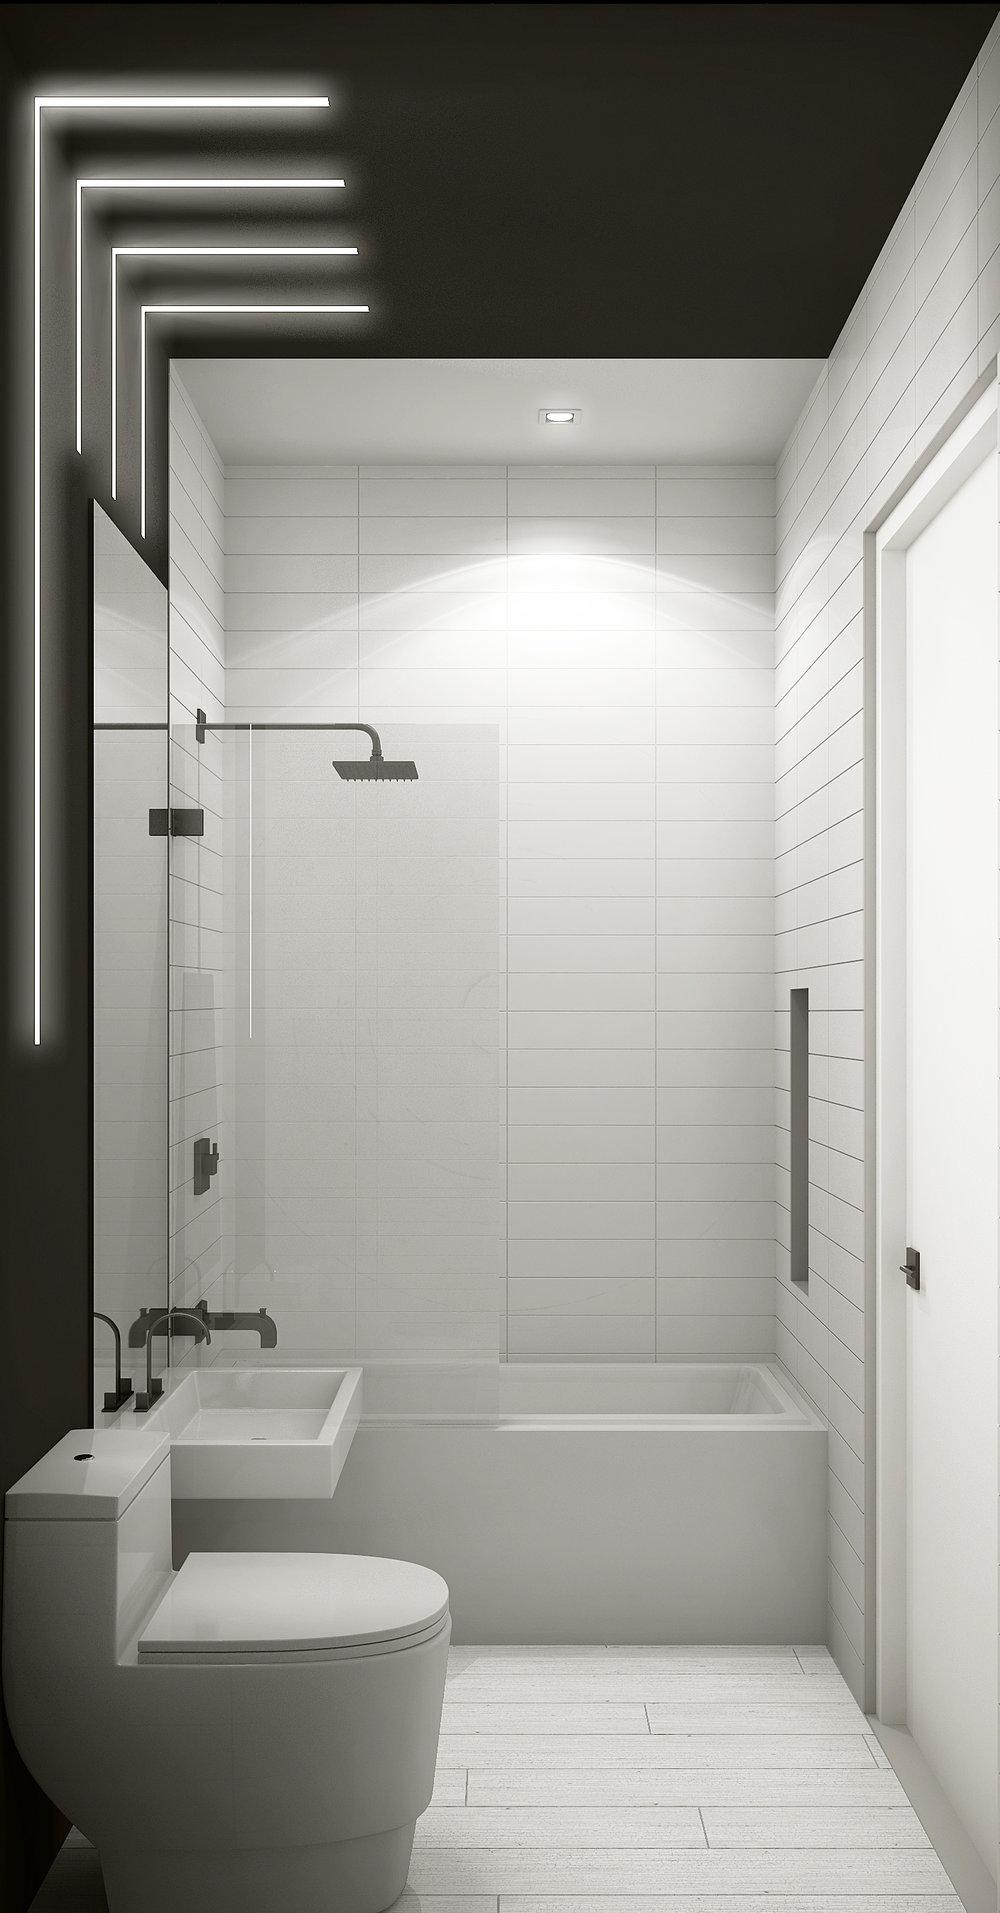 241Devoe_bathroom_scene2 (1).jpg